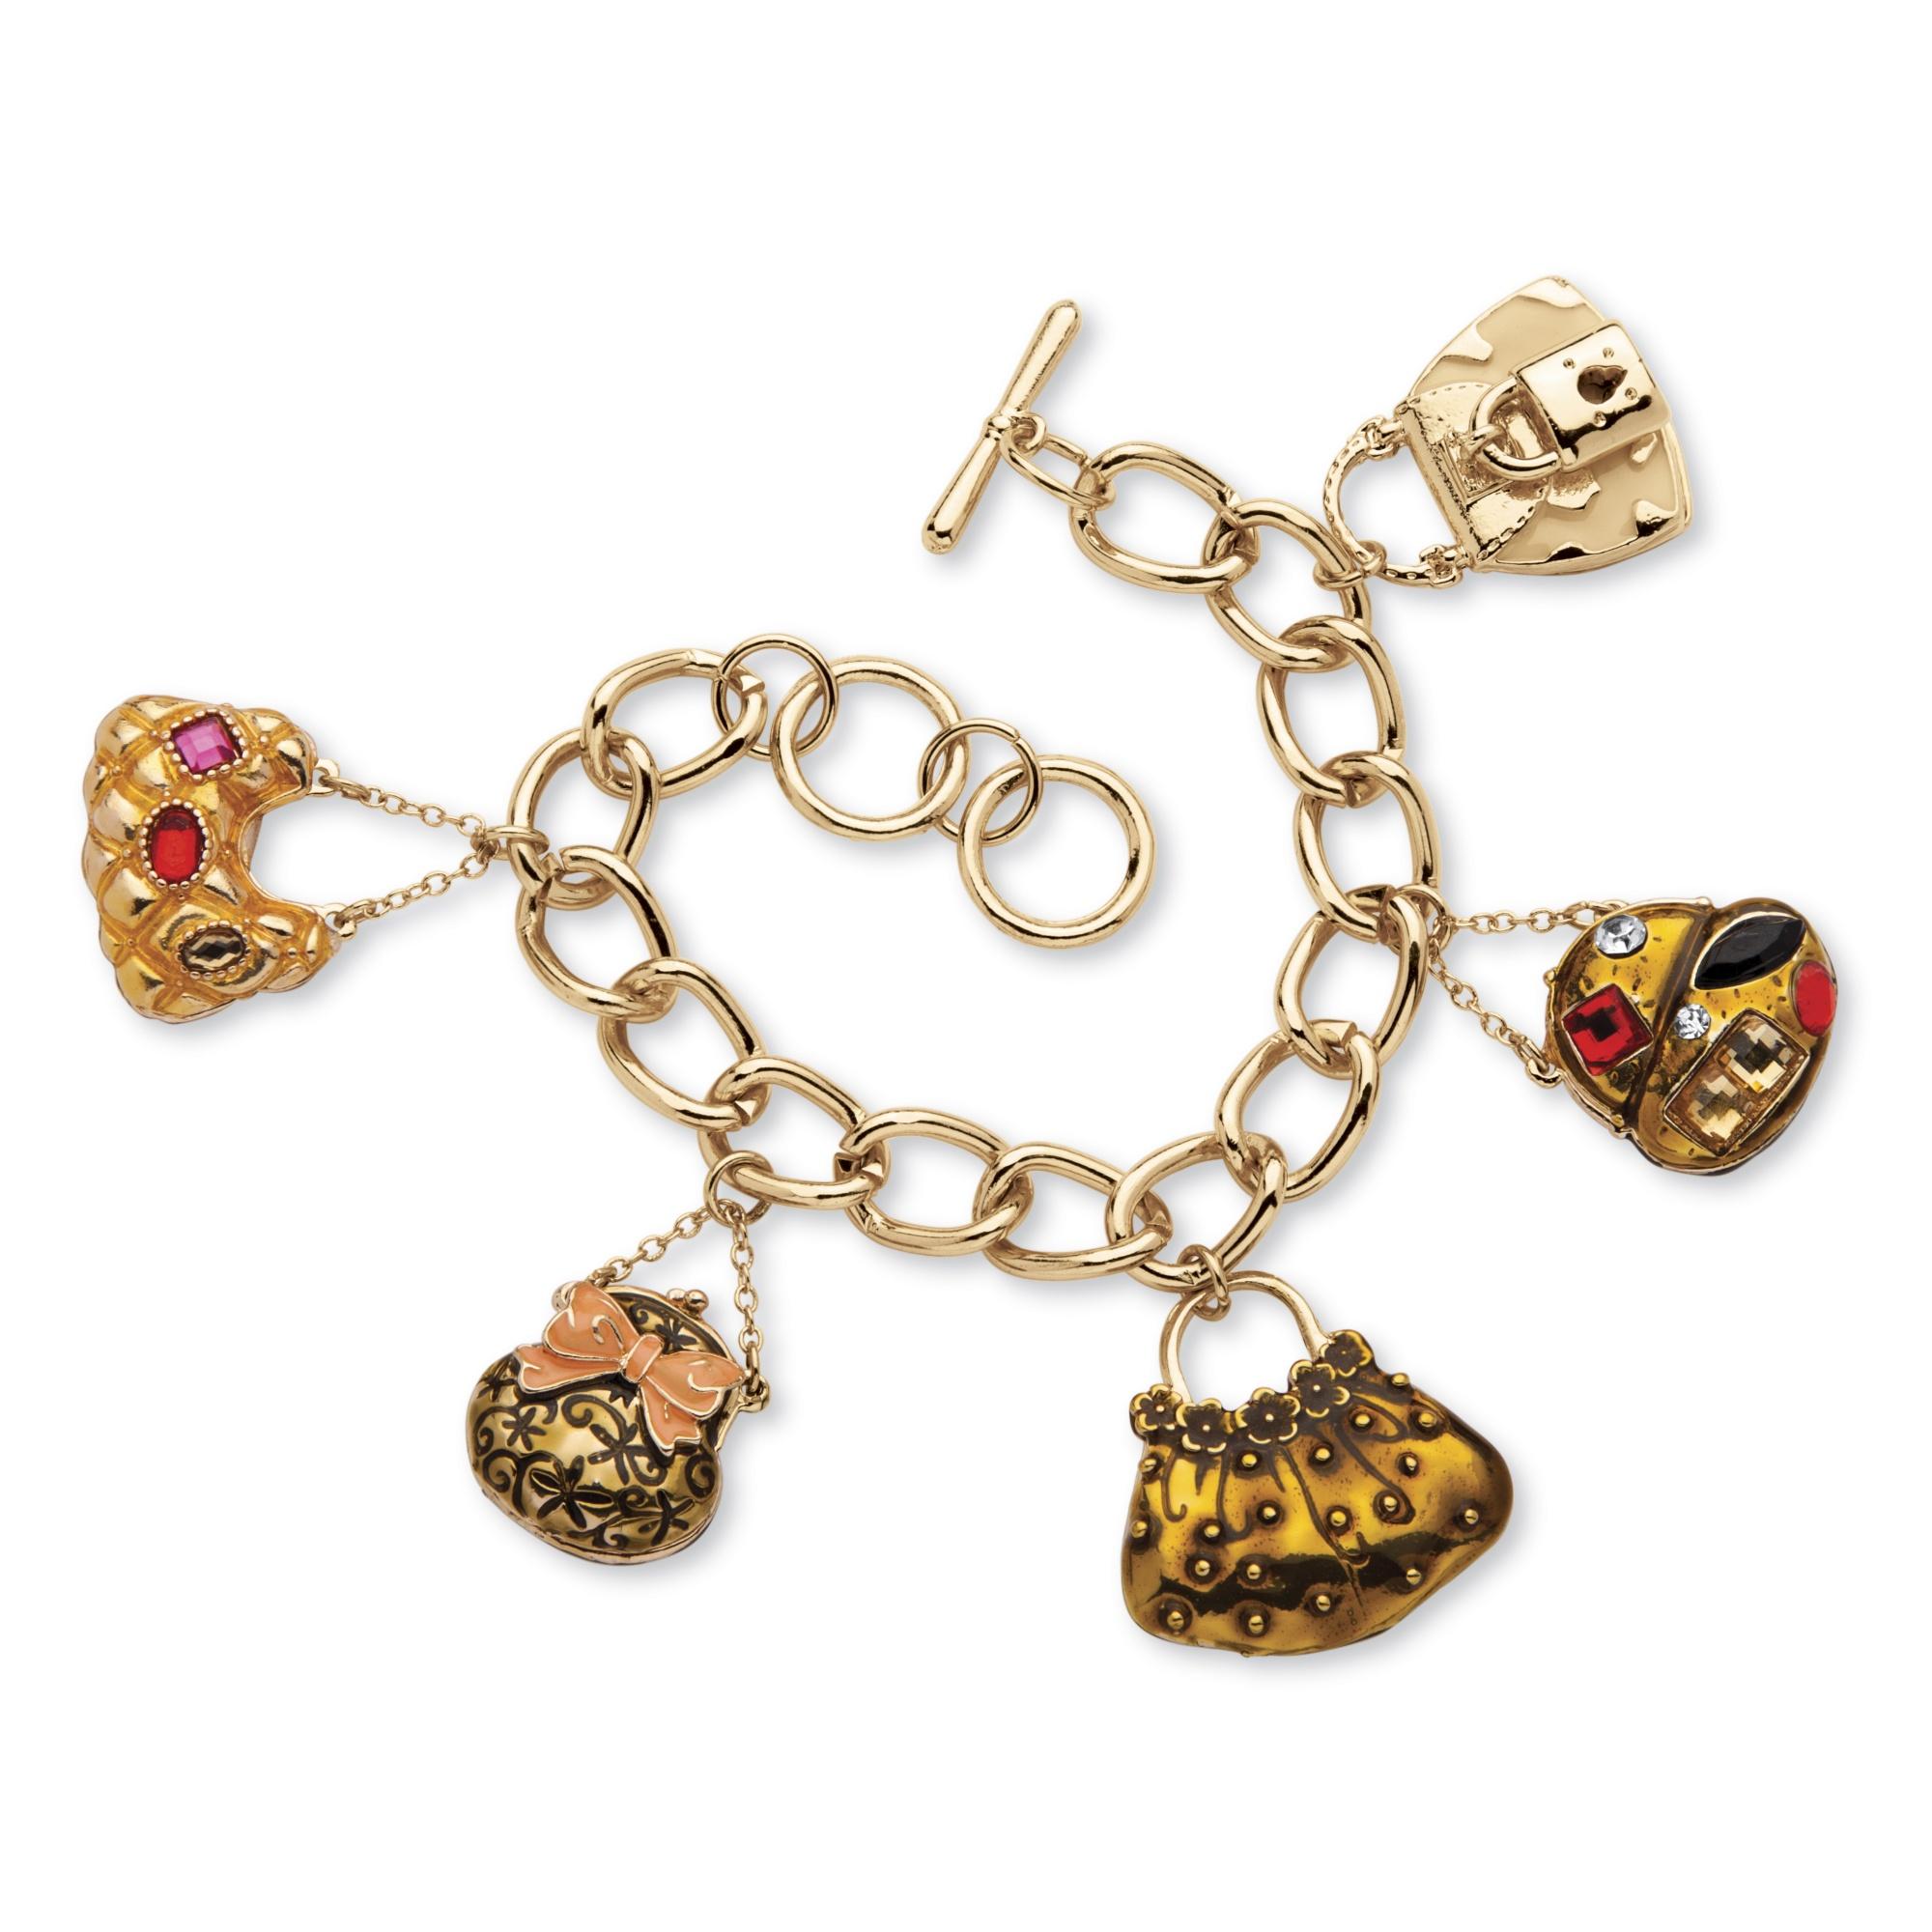 "Enamel Charms For Bracelets: Crystal ""Handbag Heaven"" Charm Bracelet In Enamel And"